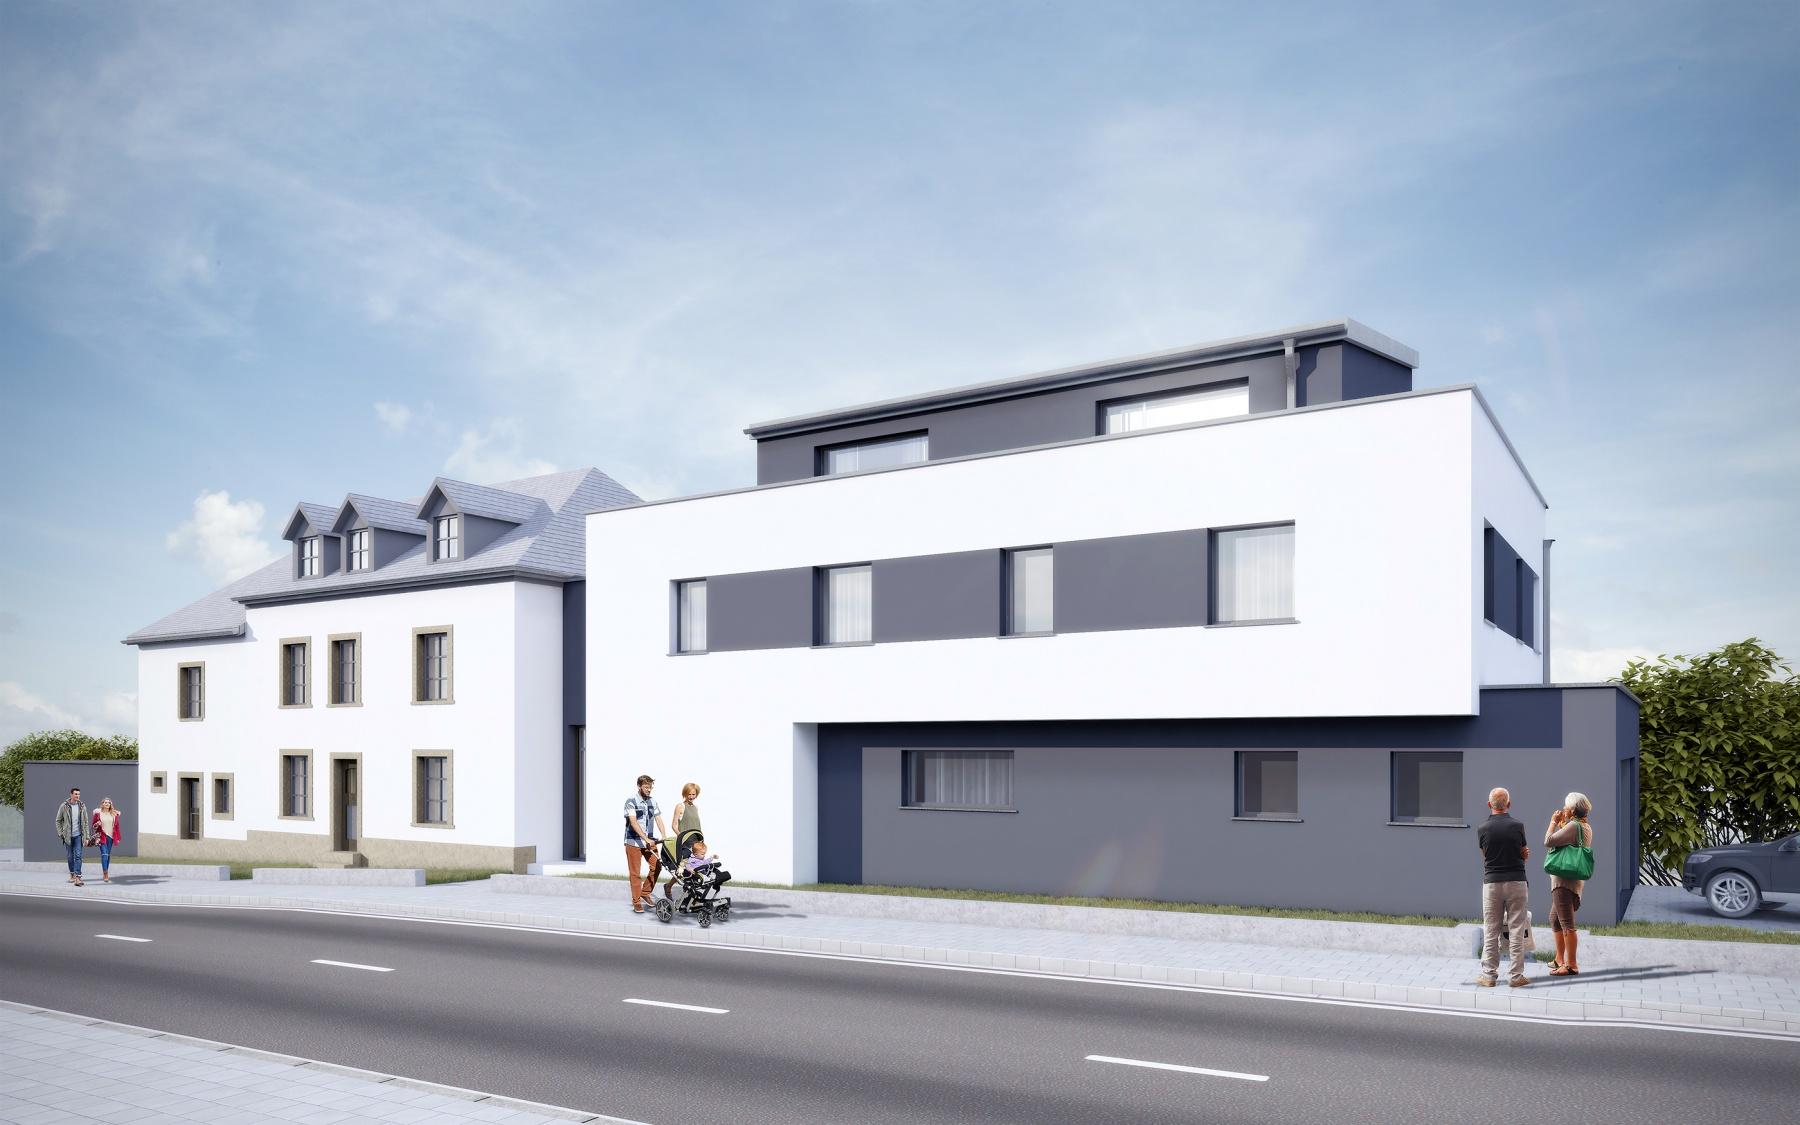 New semi-detached house in Fennange